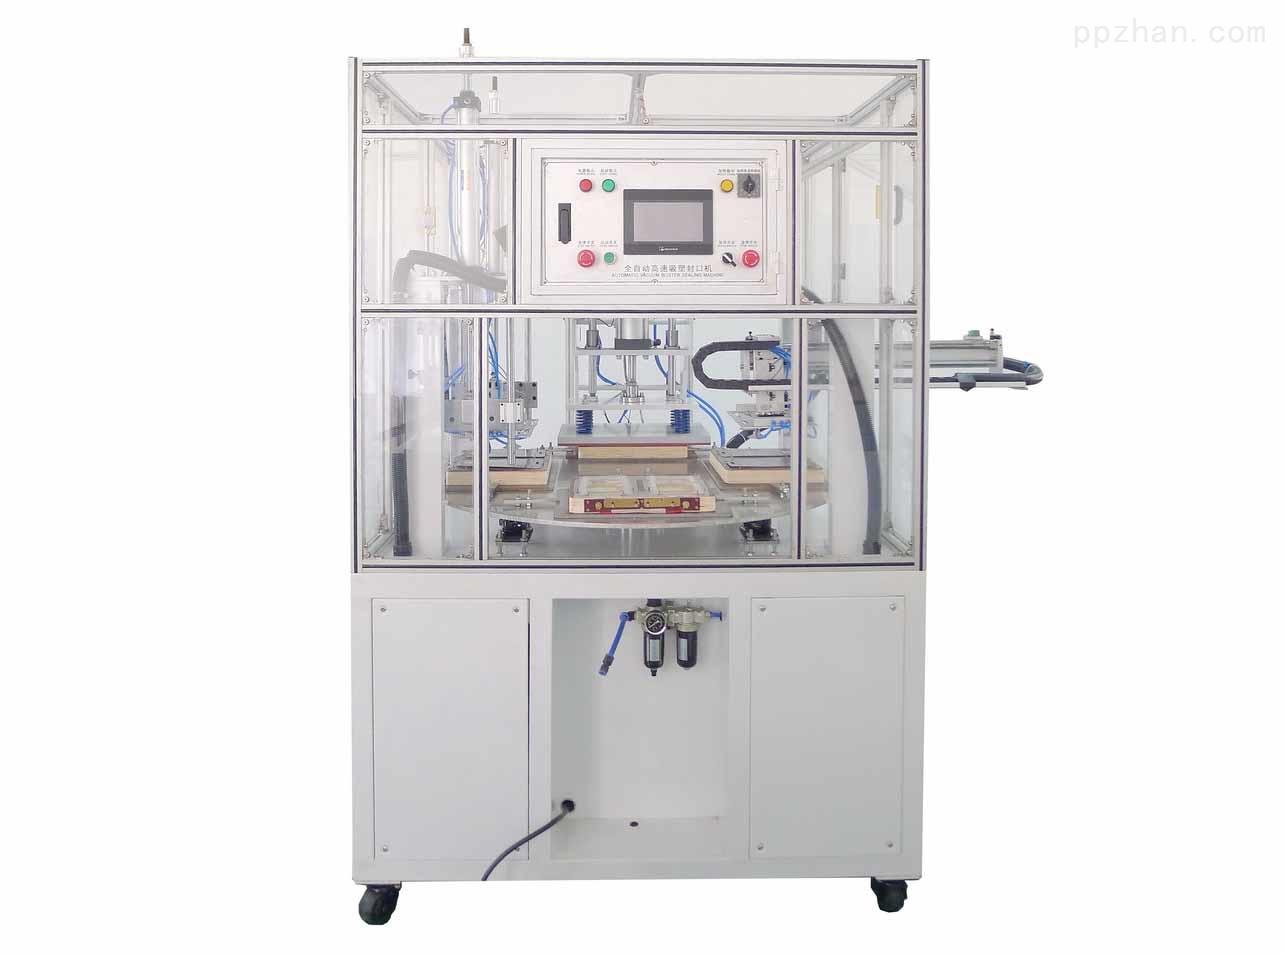 HX-50B 全自动 转盘式 吸塑纸卡 包装机 热压封合机